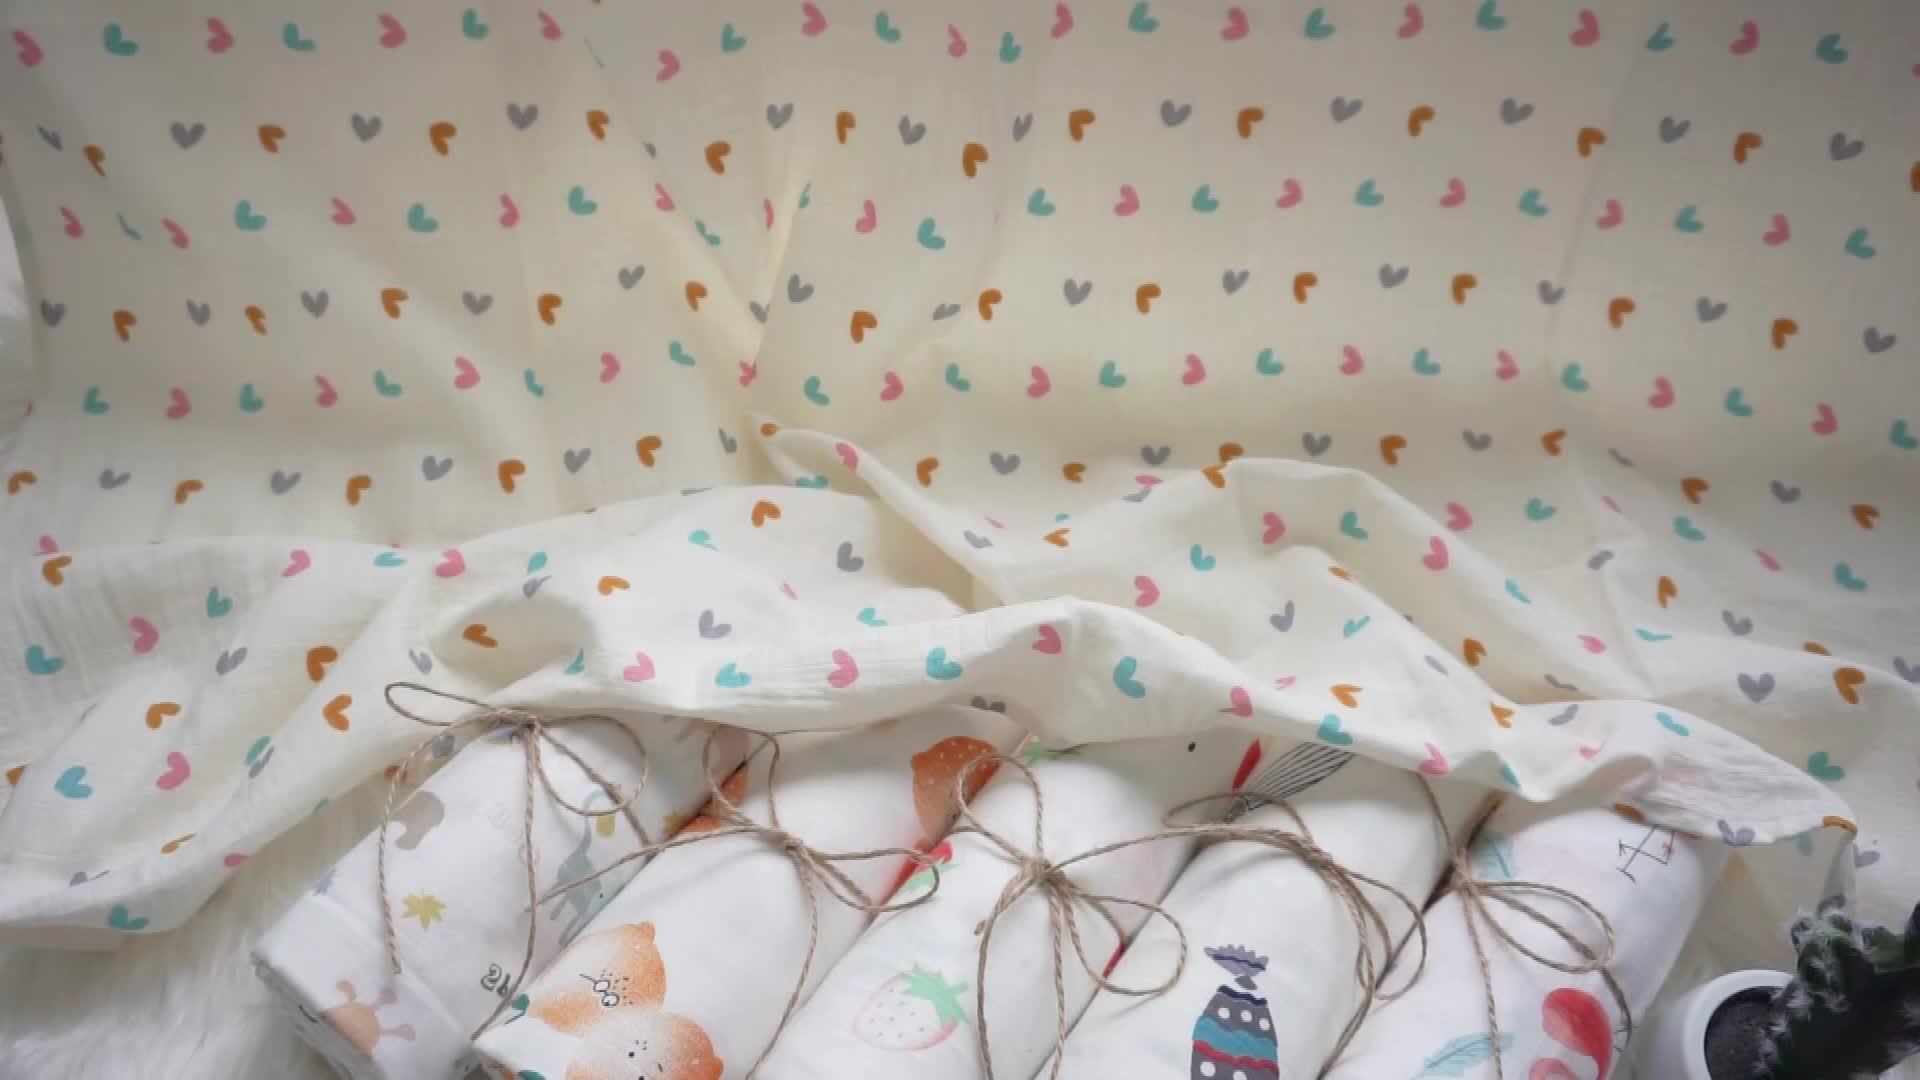 Best price super soft joyous pattern 100% cotton wrap baby muslin swaddle blanket